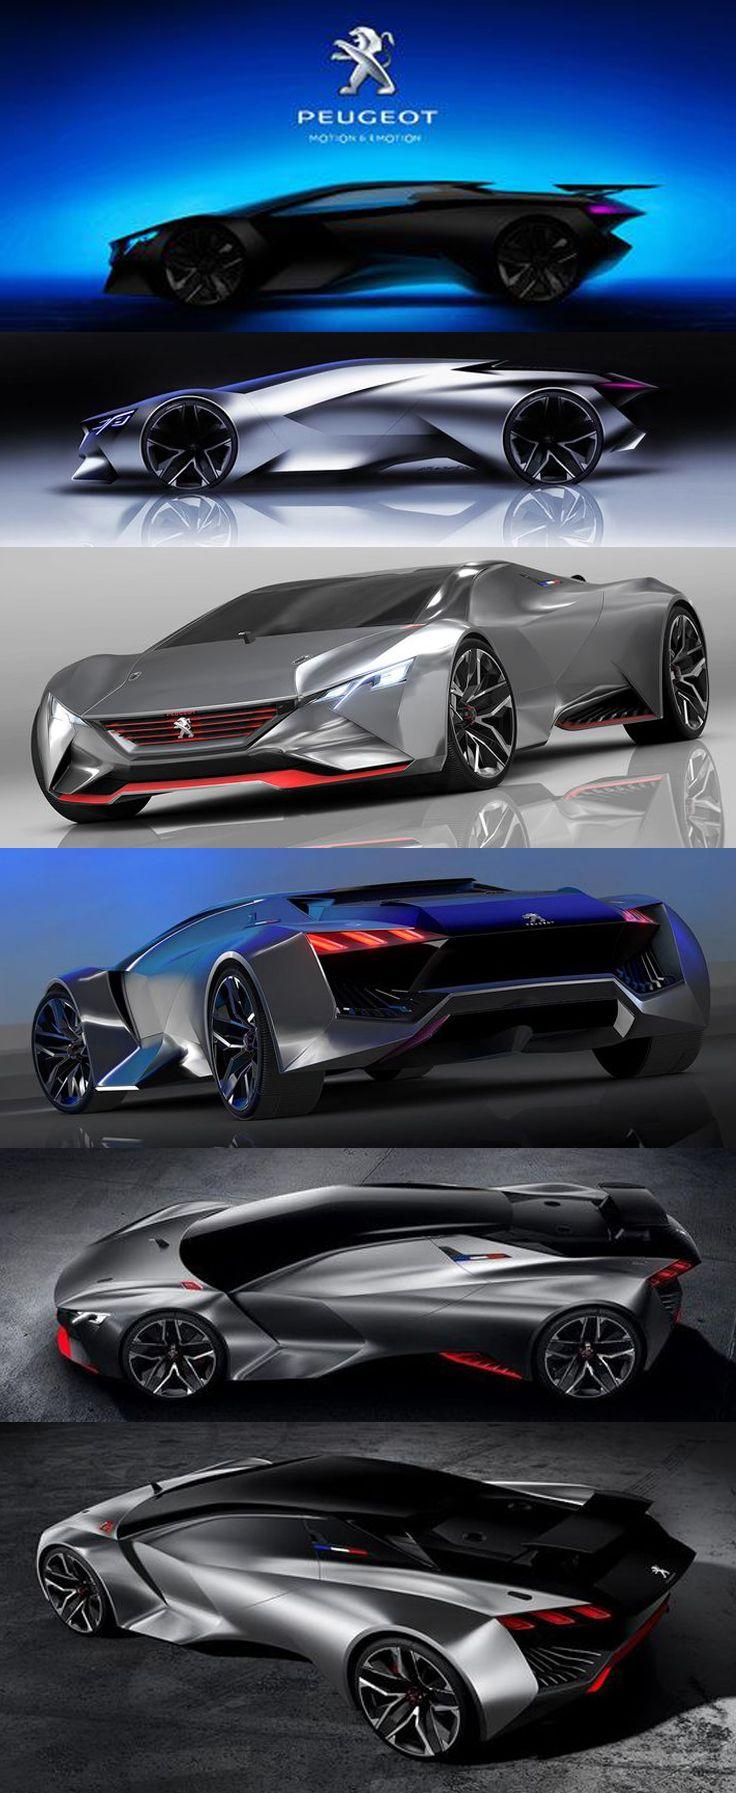 Peugeot Vision Gran Turismo concept                                                                                                                                                      More